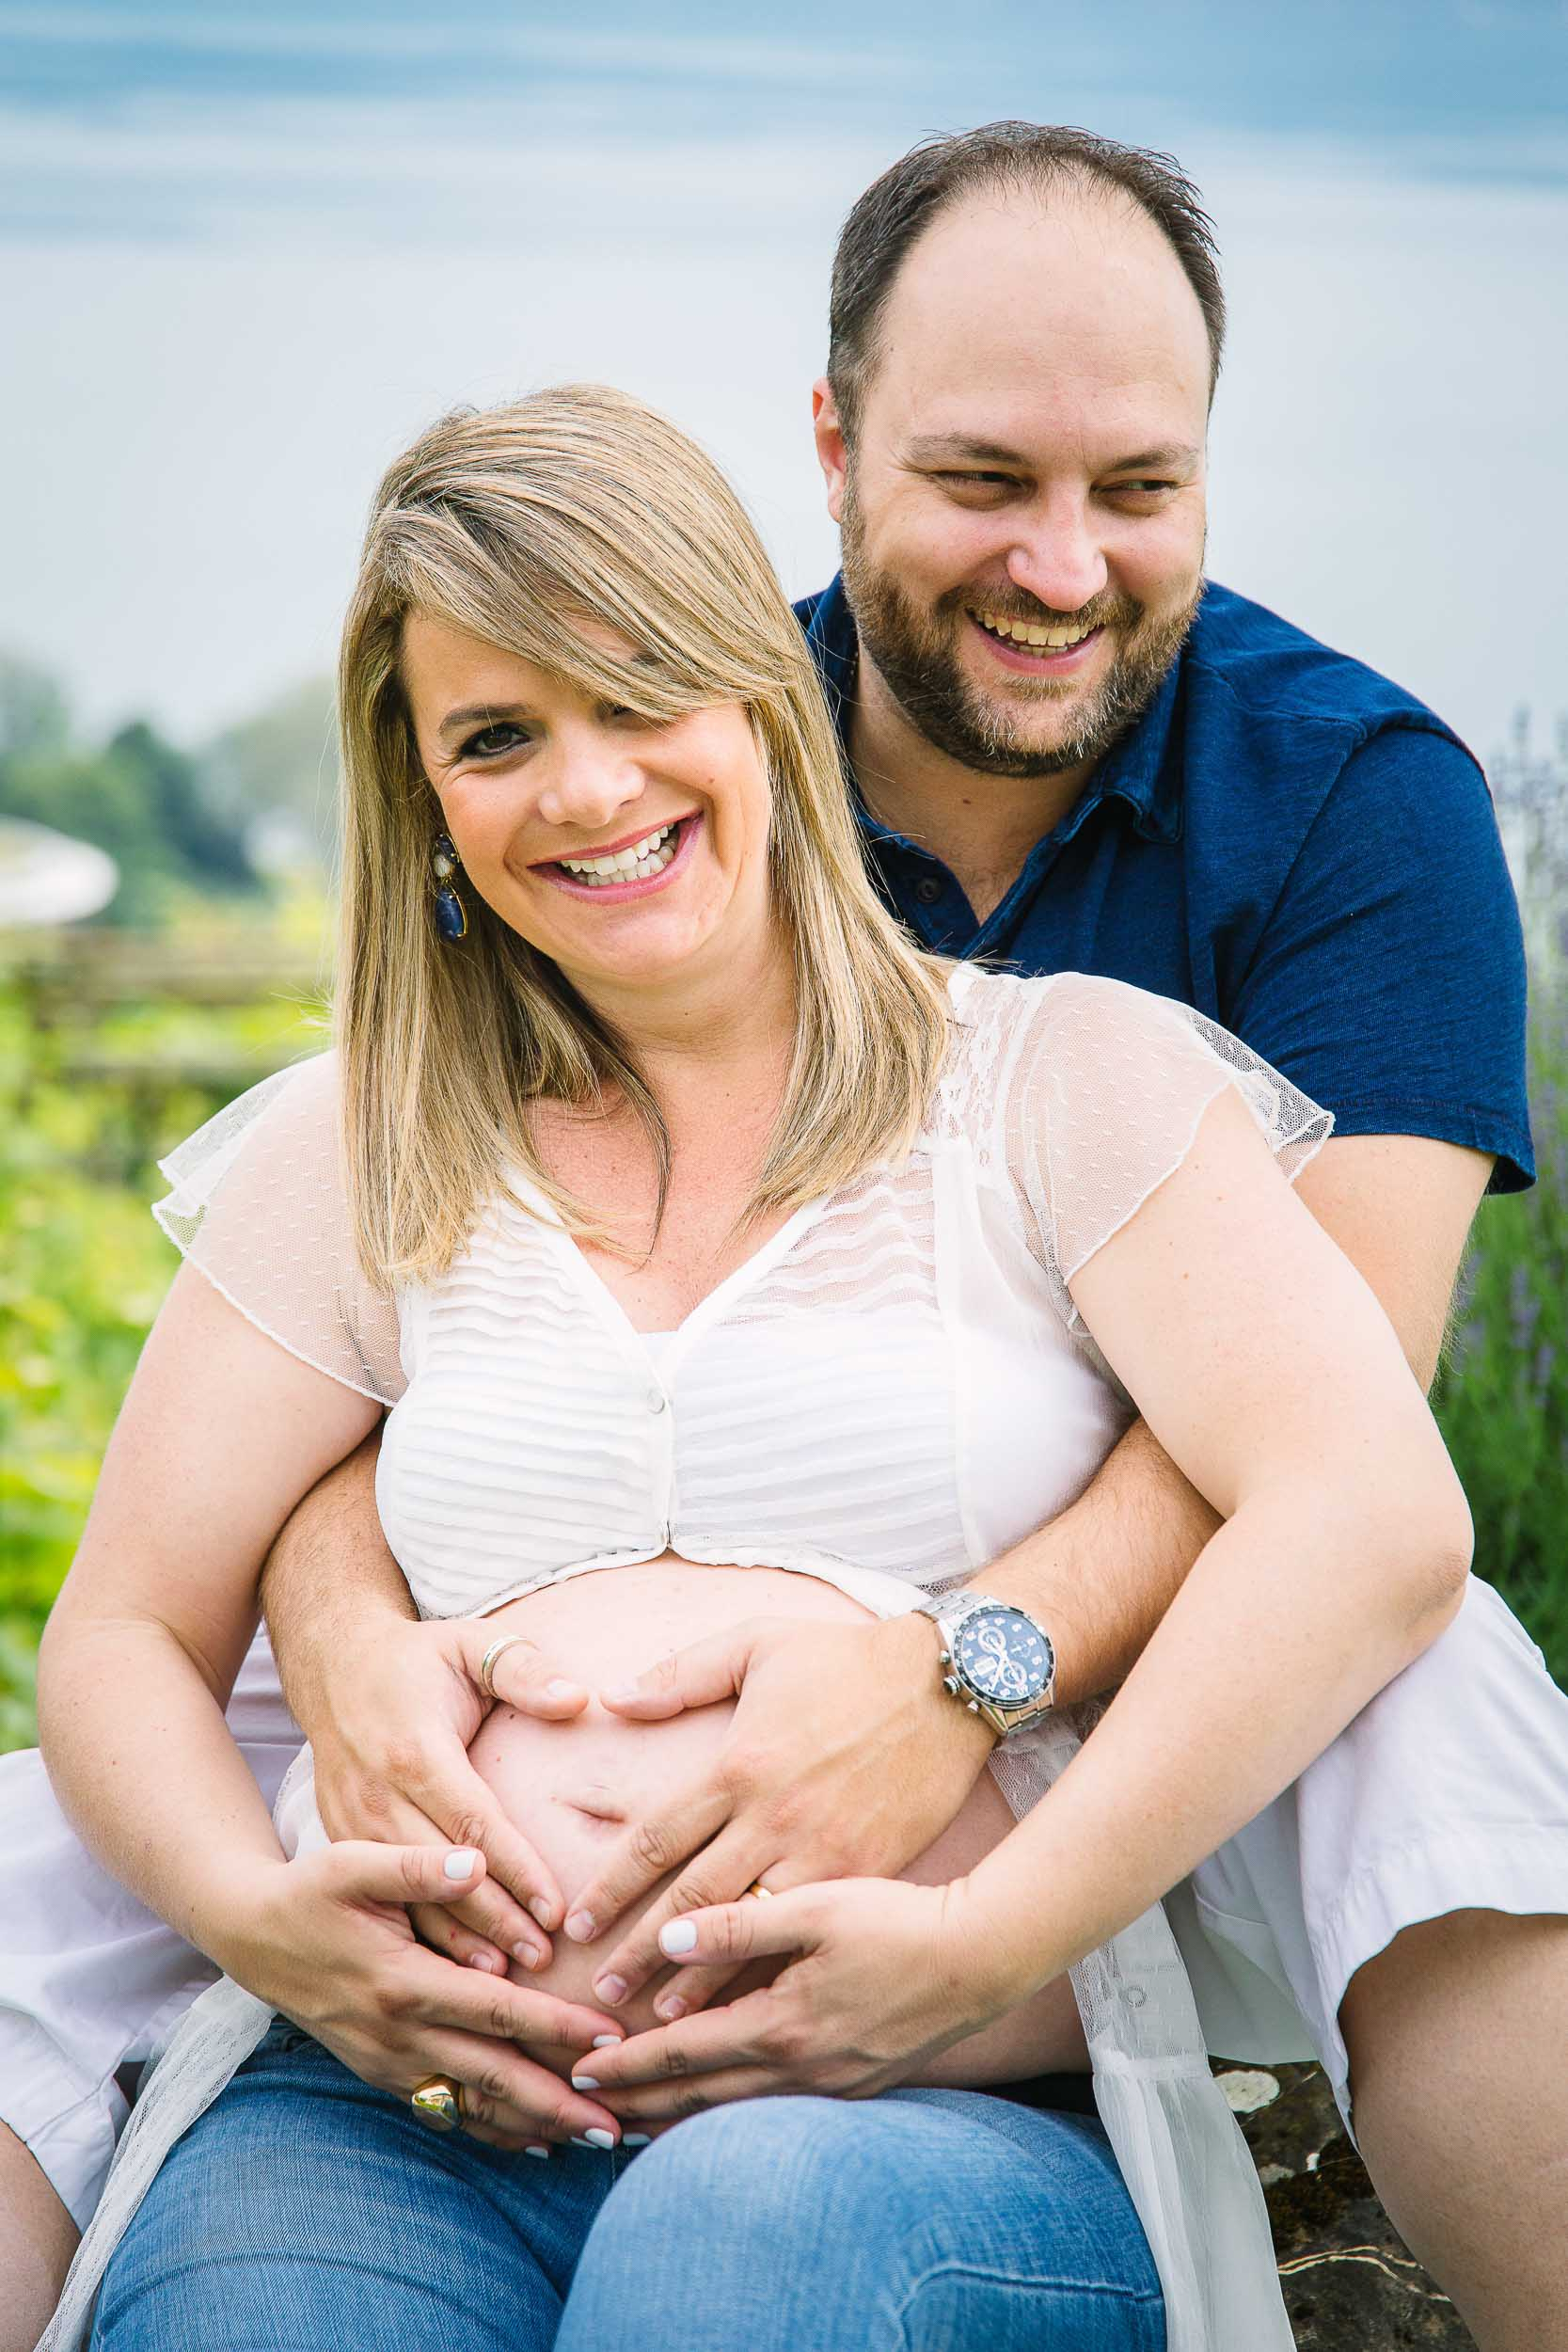 054-Caren-Maternity3-7891-col.jpg